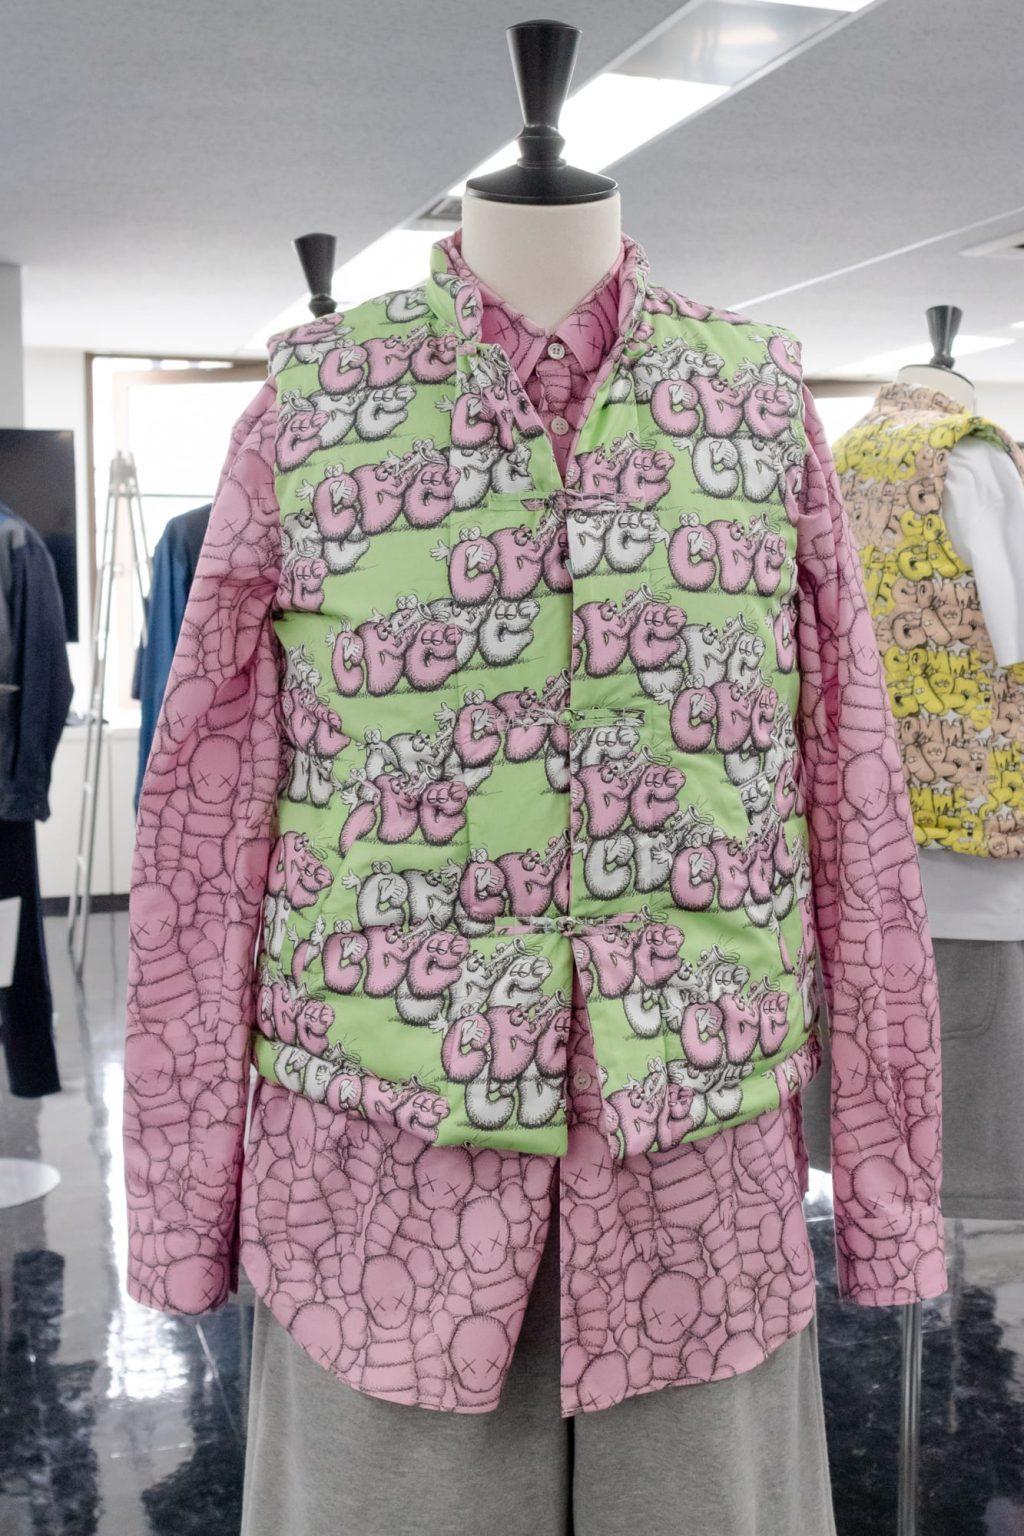 kaws-comme-des-garcons-shirt-21aw-collaboration-release-202108